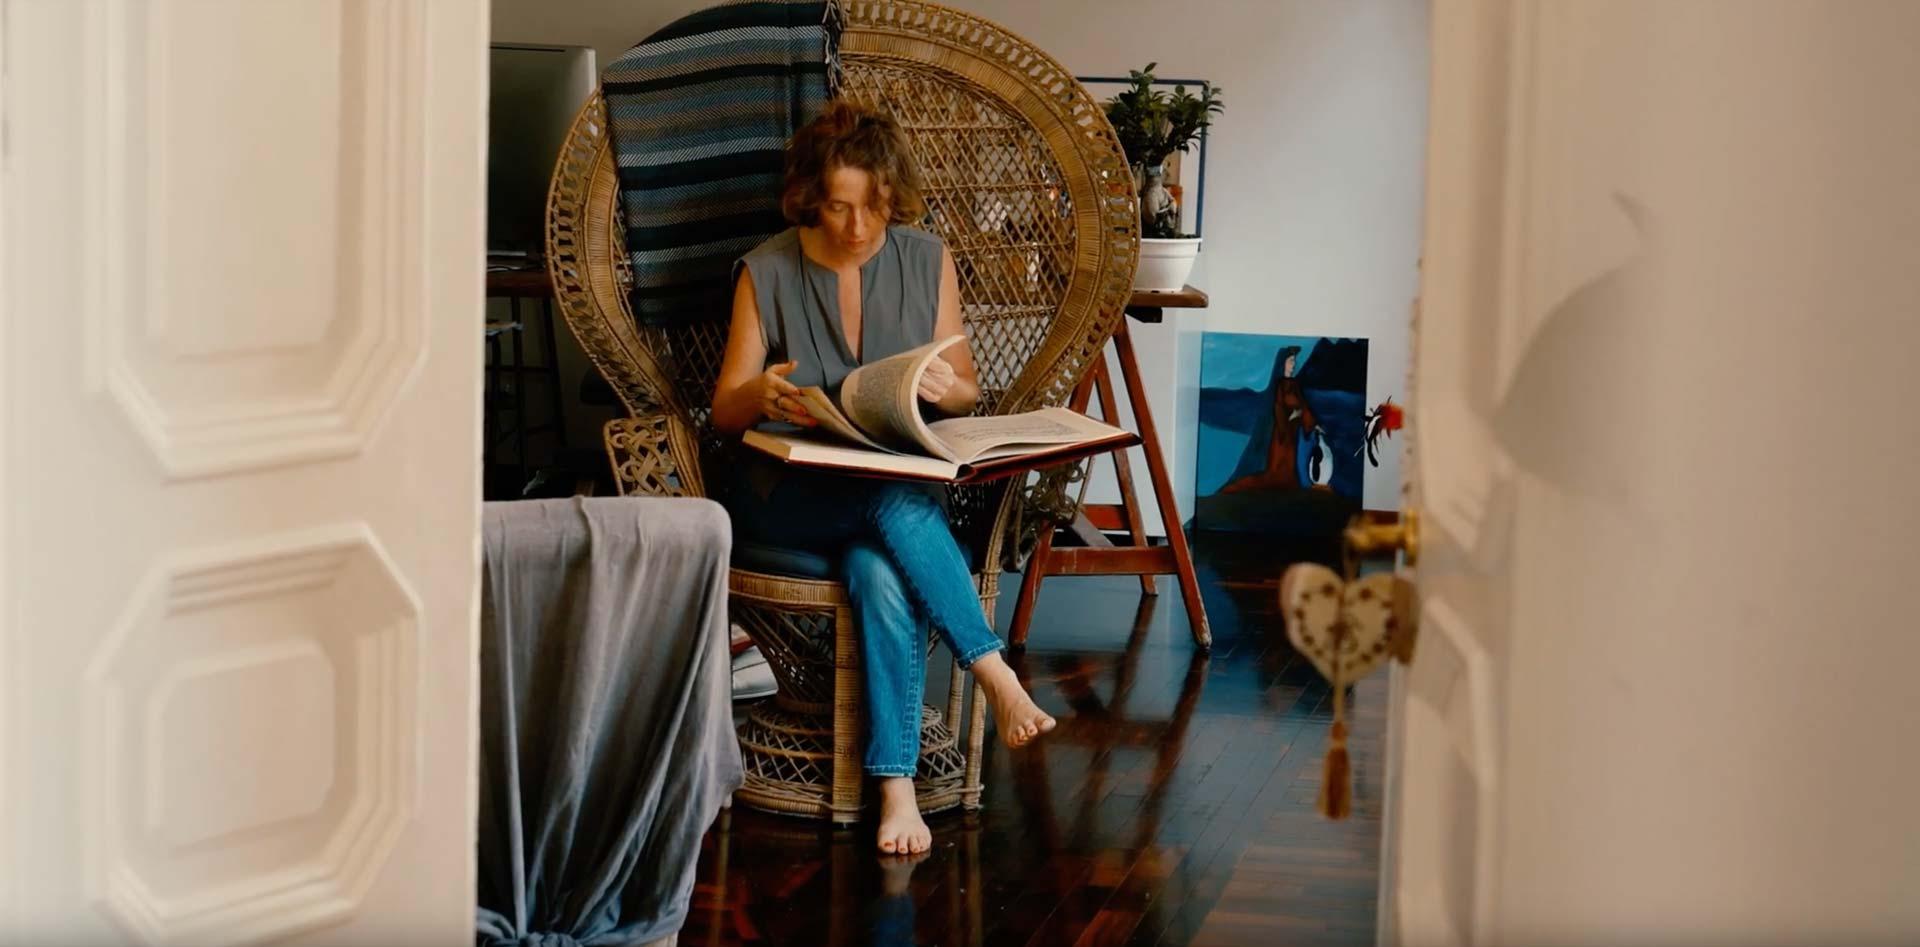 Stefania Squeglia in the Atelier